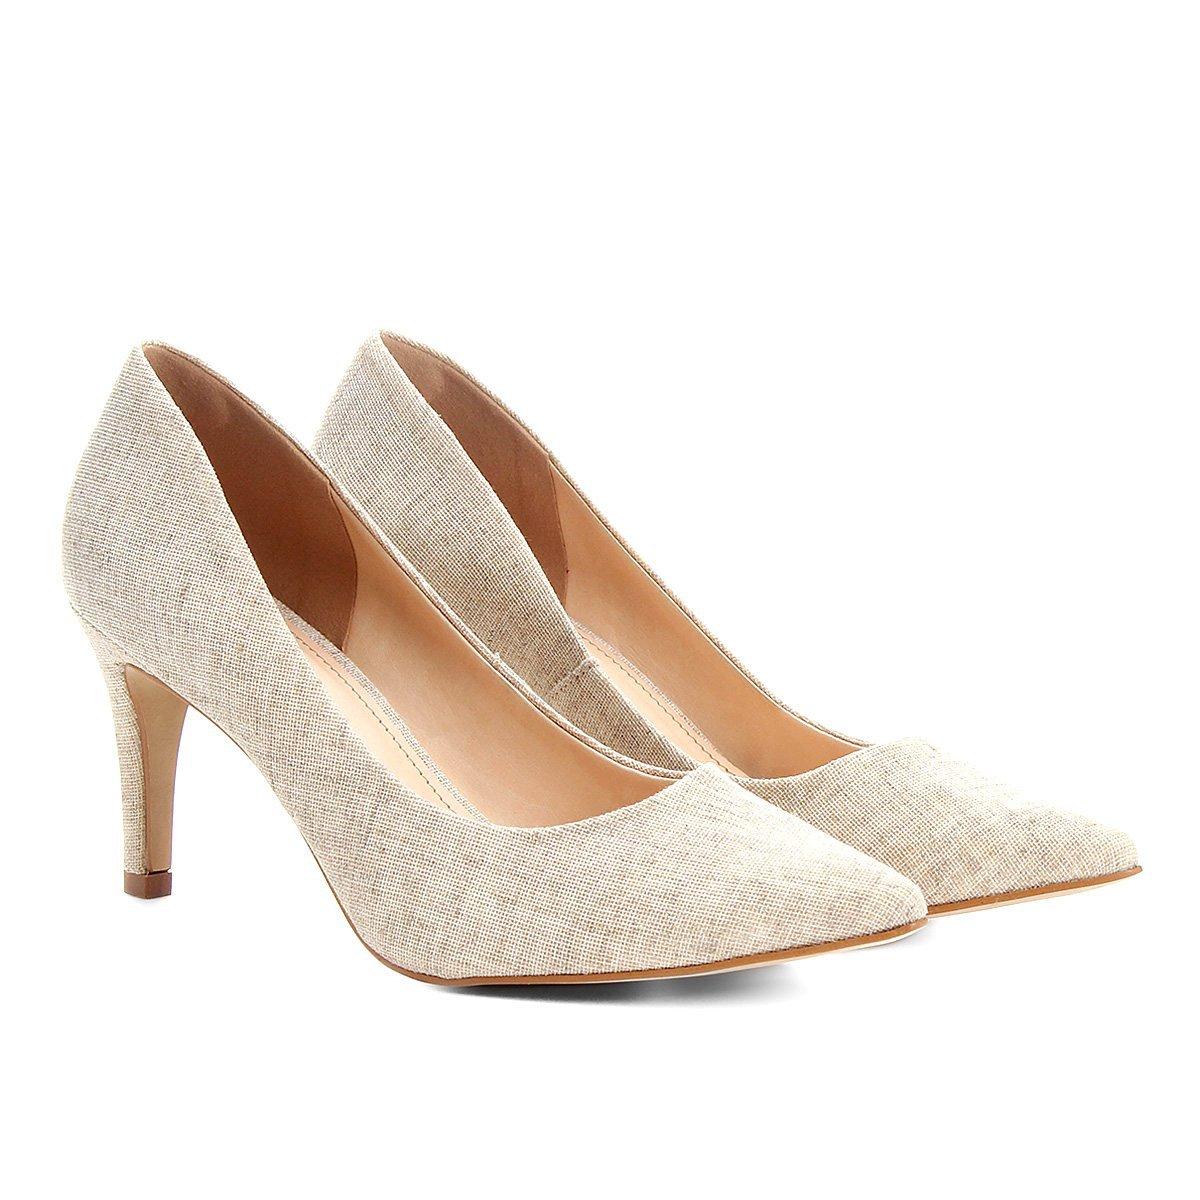 be068993a Scarpin Shoestock Salto Médio   Shoestock